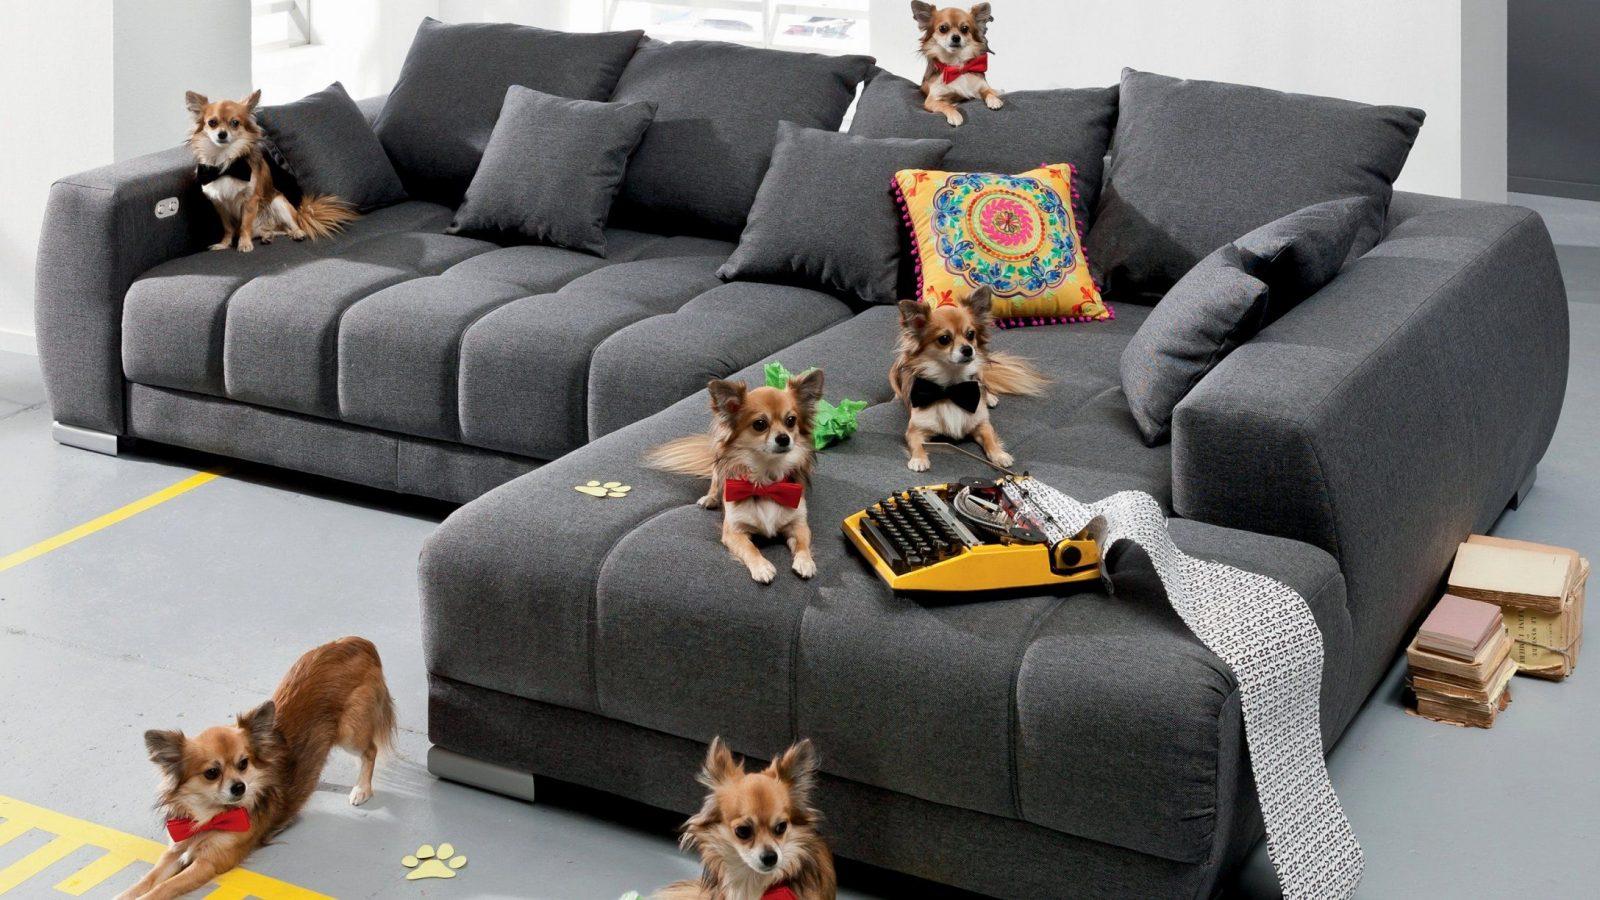 30 Sparkling Möbel As Angebote Images  Gamerbounty von Möbel As Bruchsal Angebote Bild